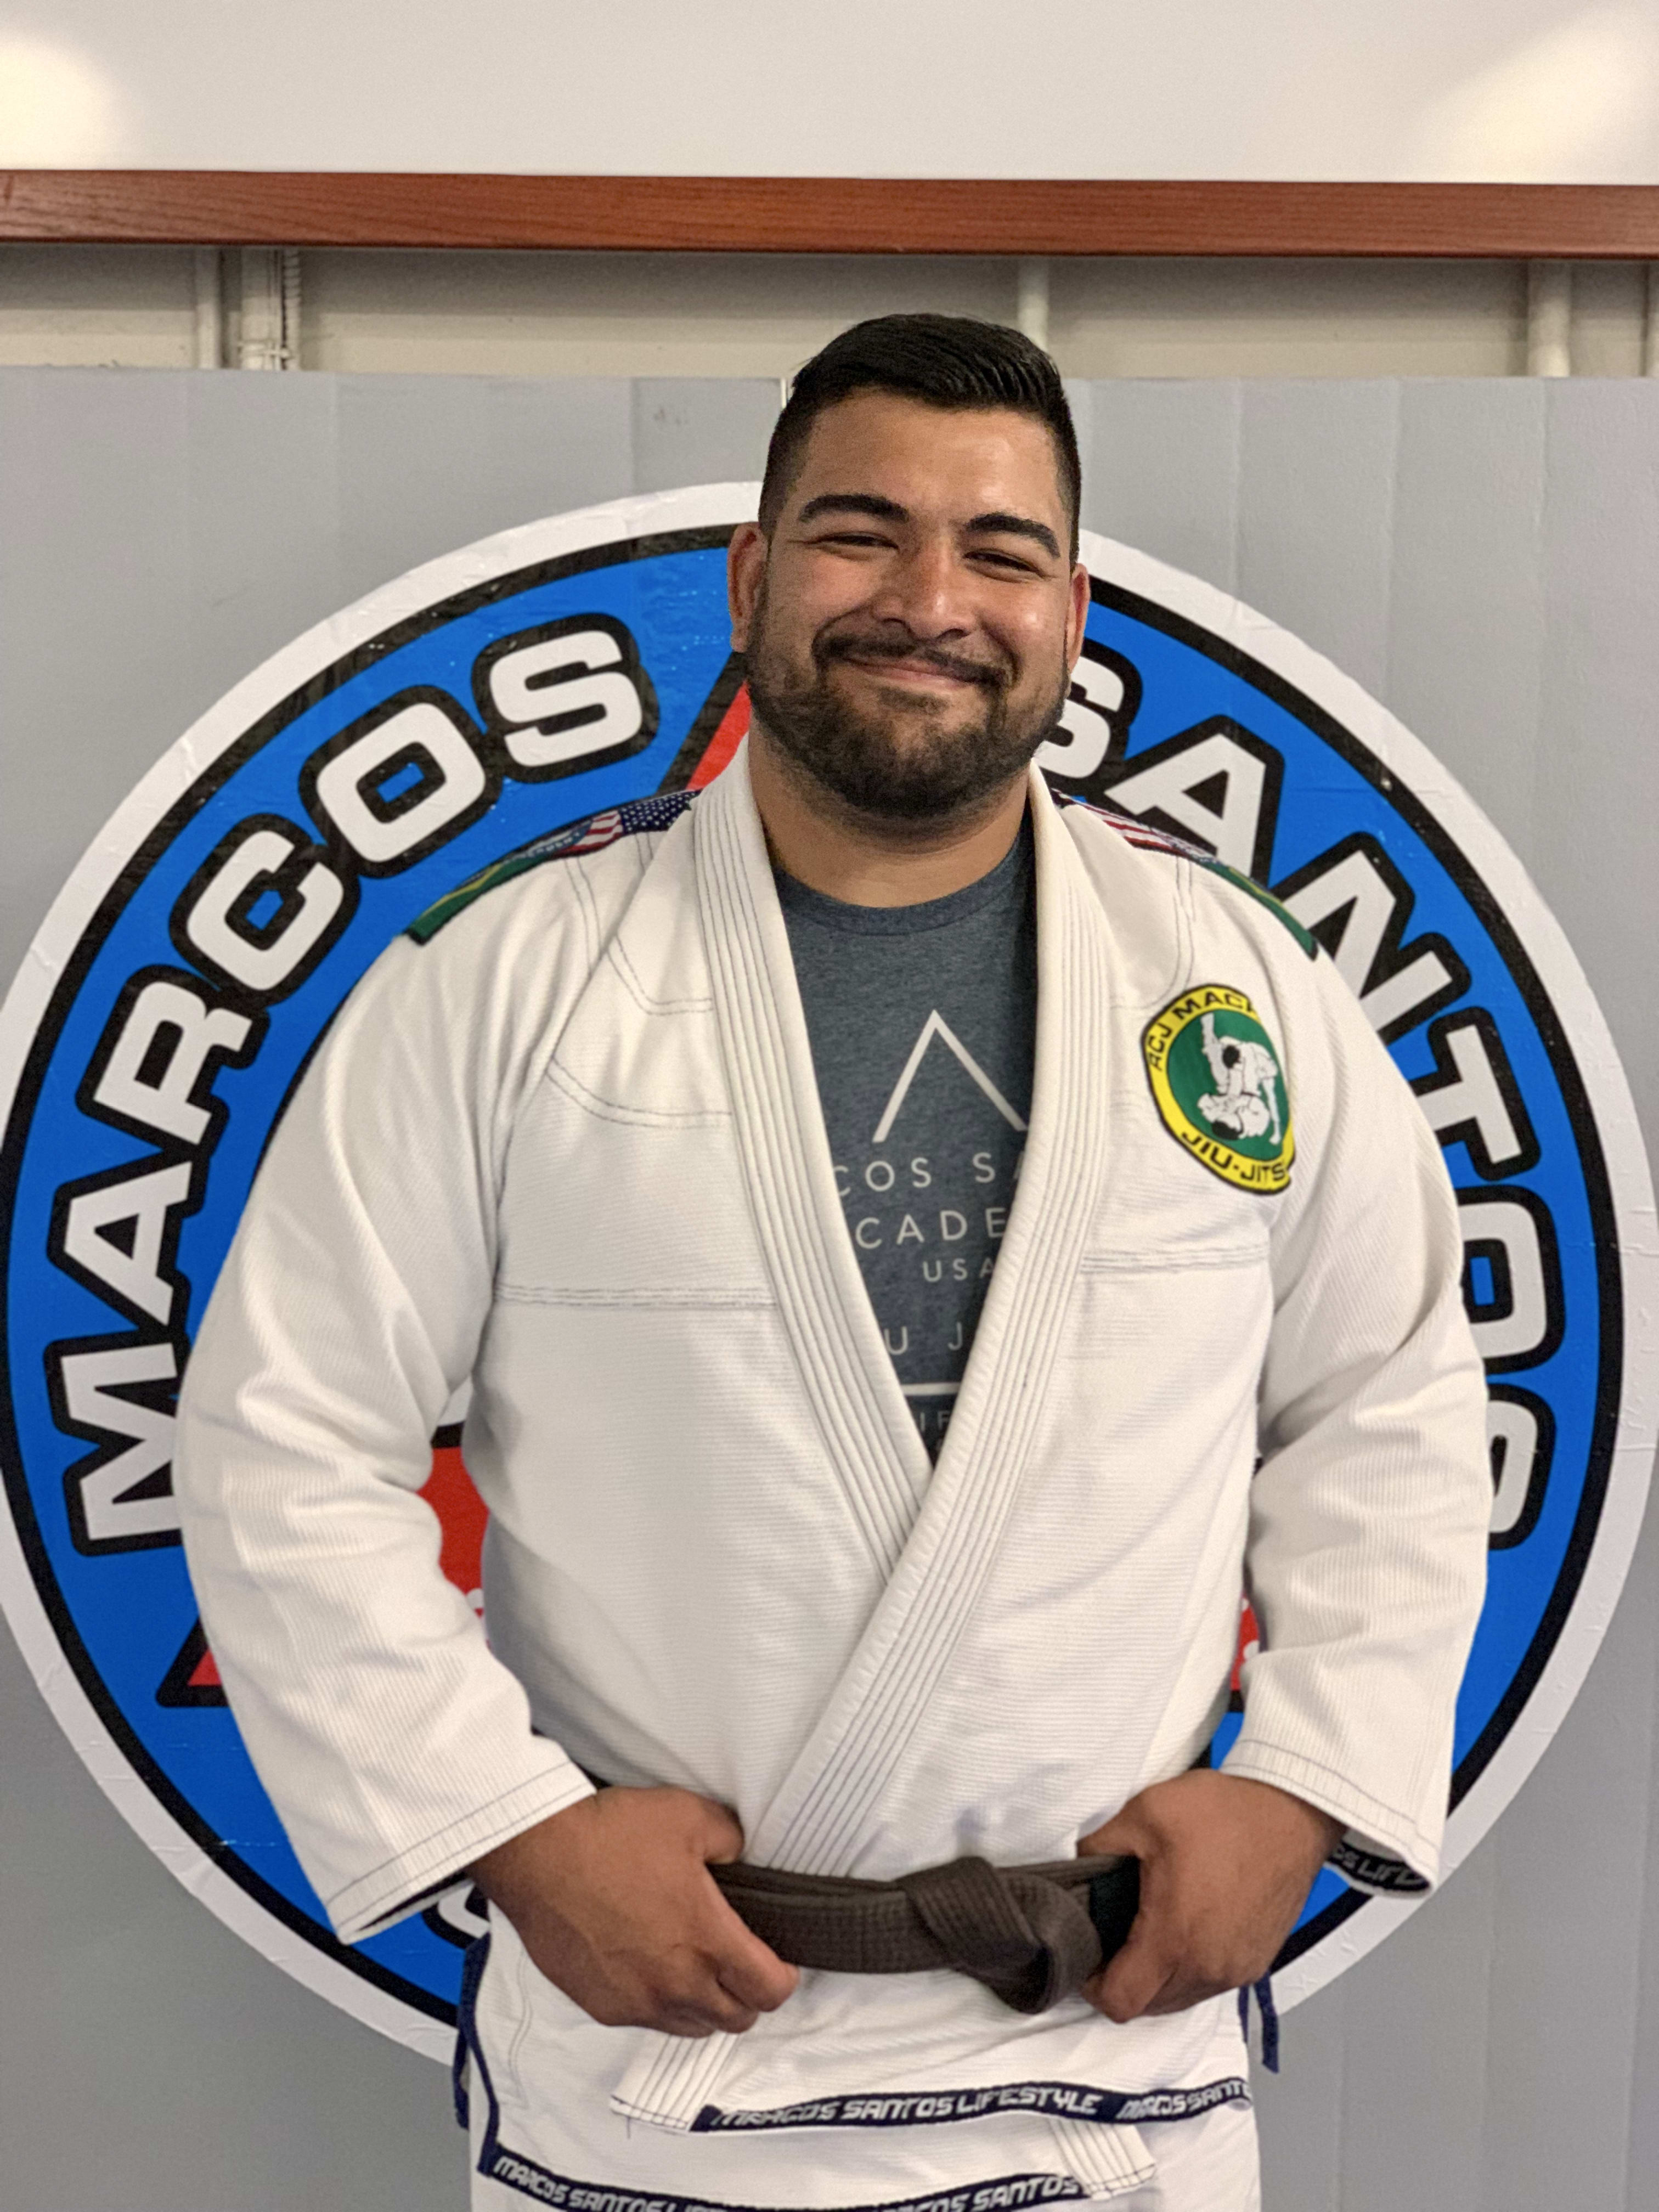 Hugo Muñoz in Fort Worth - Marcos Santos Academy